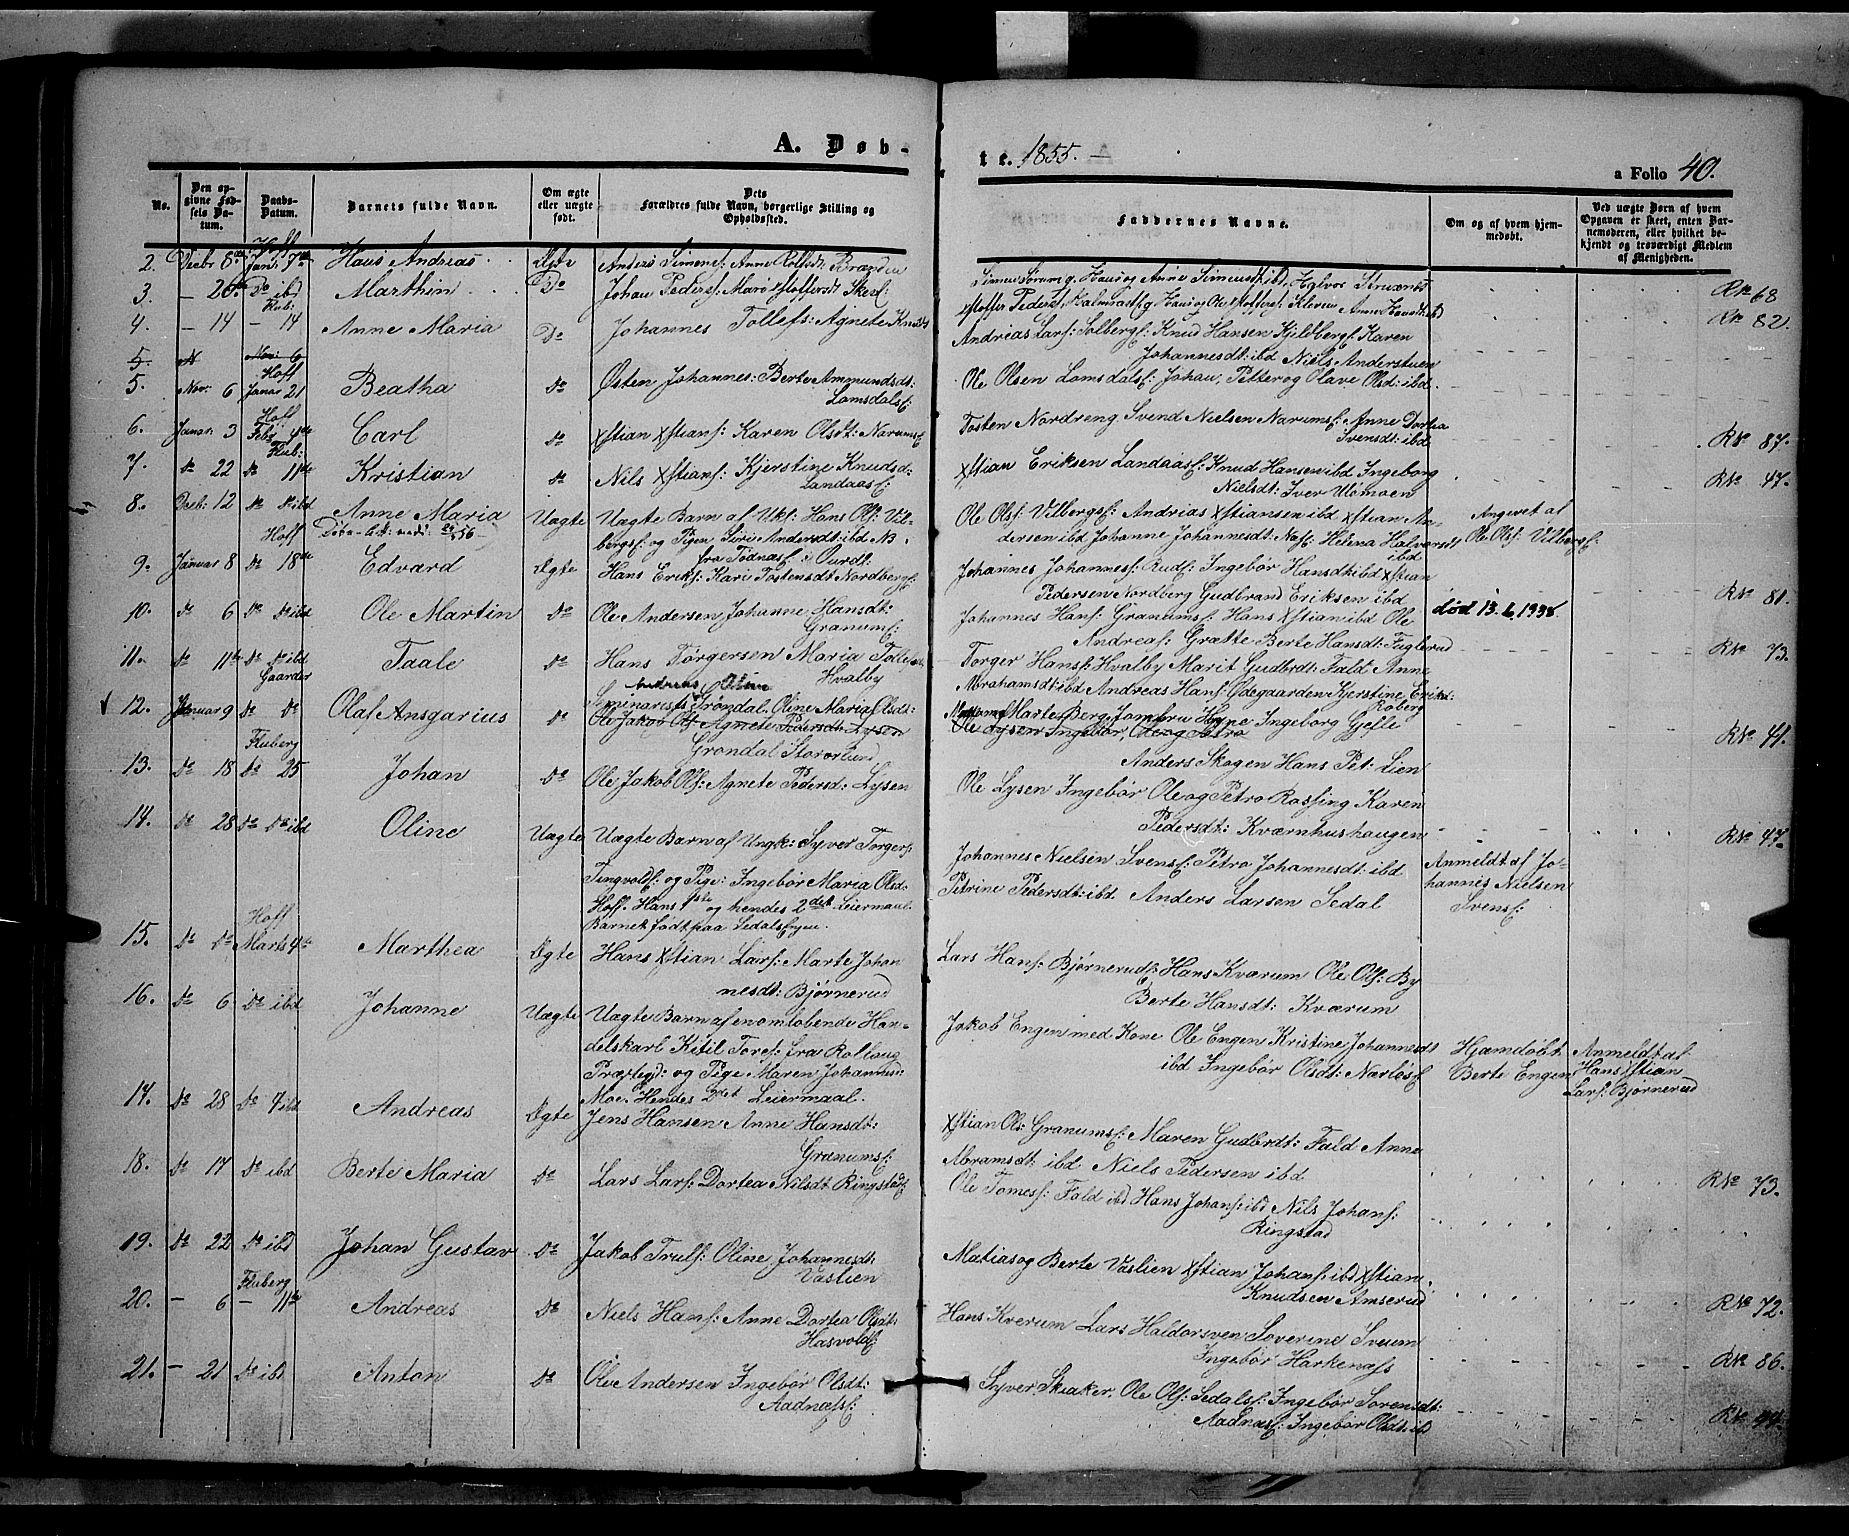 SAH, Land prestekontor, Ministerialbok nr. 9, 1847-1859, s. 40